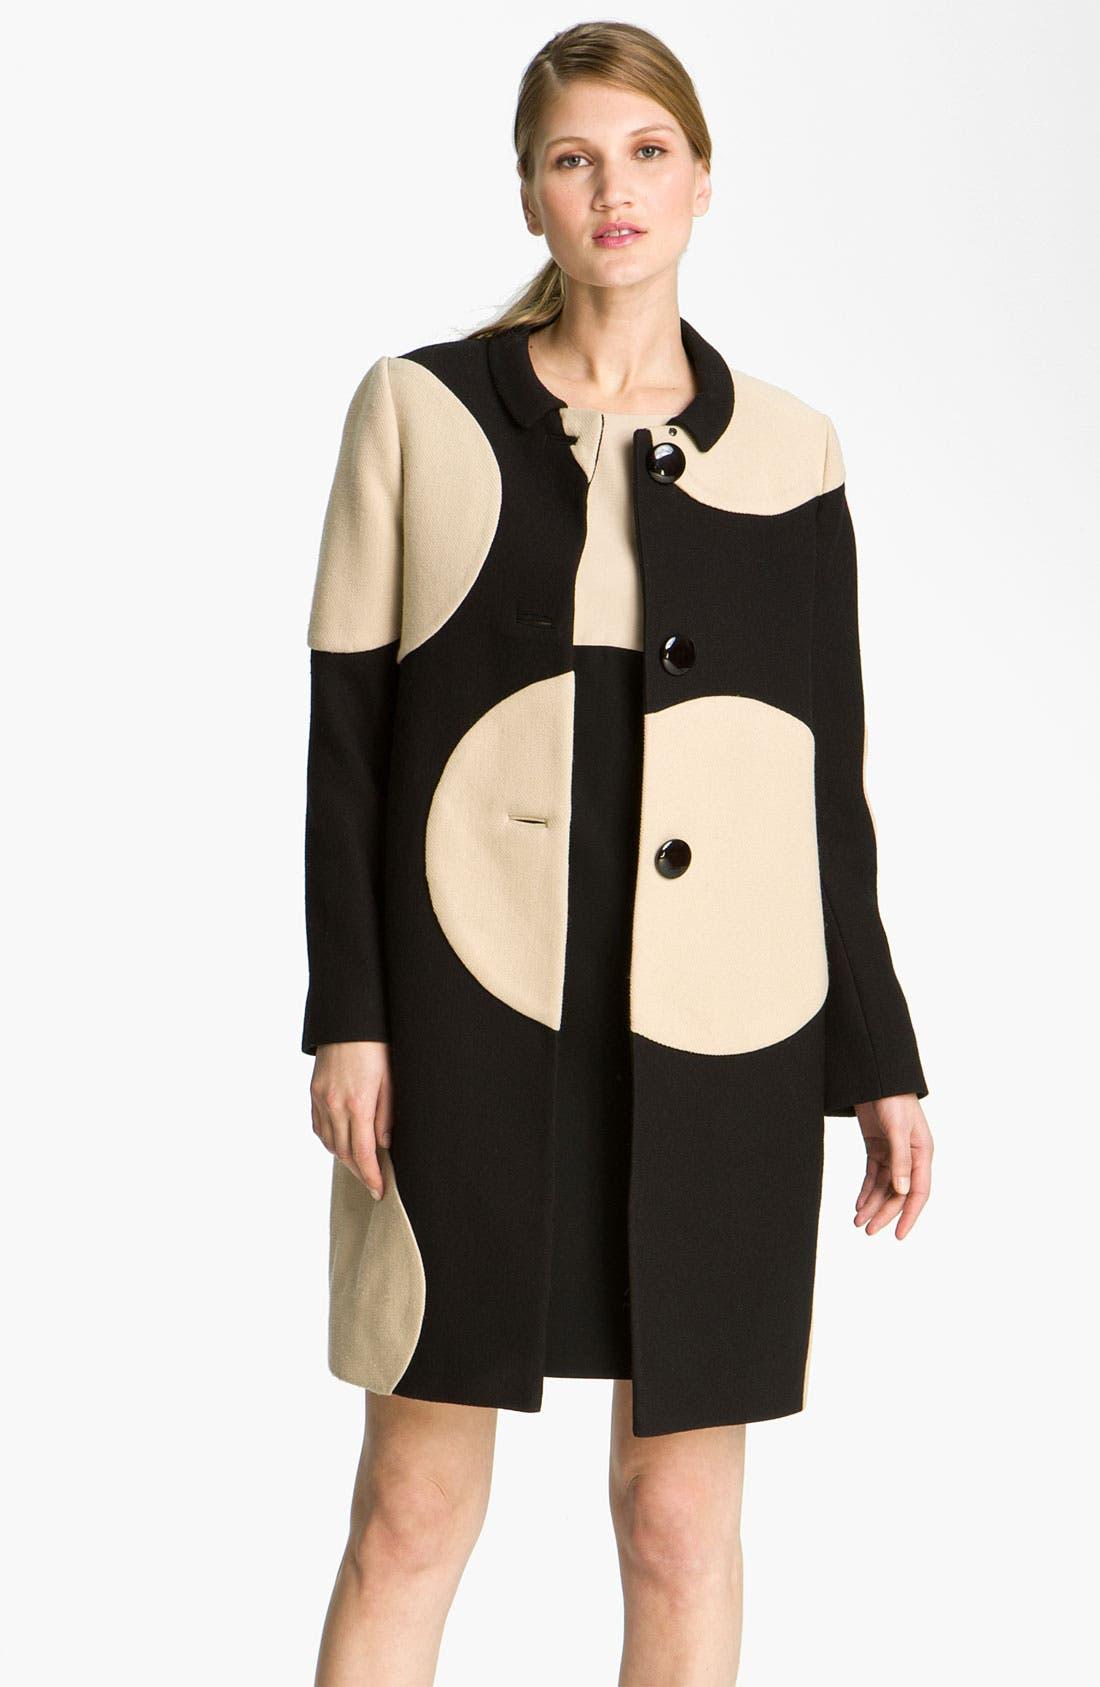 Alternate Image 1 Selected - kate spade new york 'nicky' coat